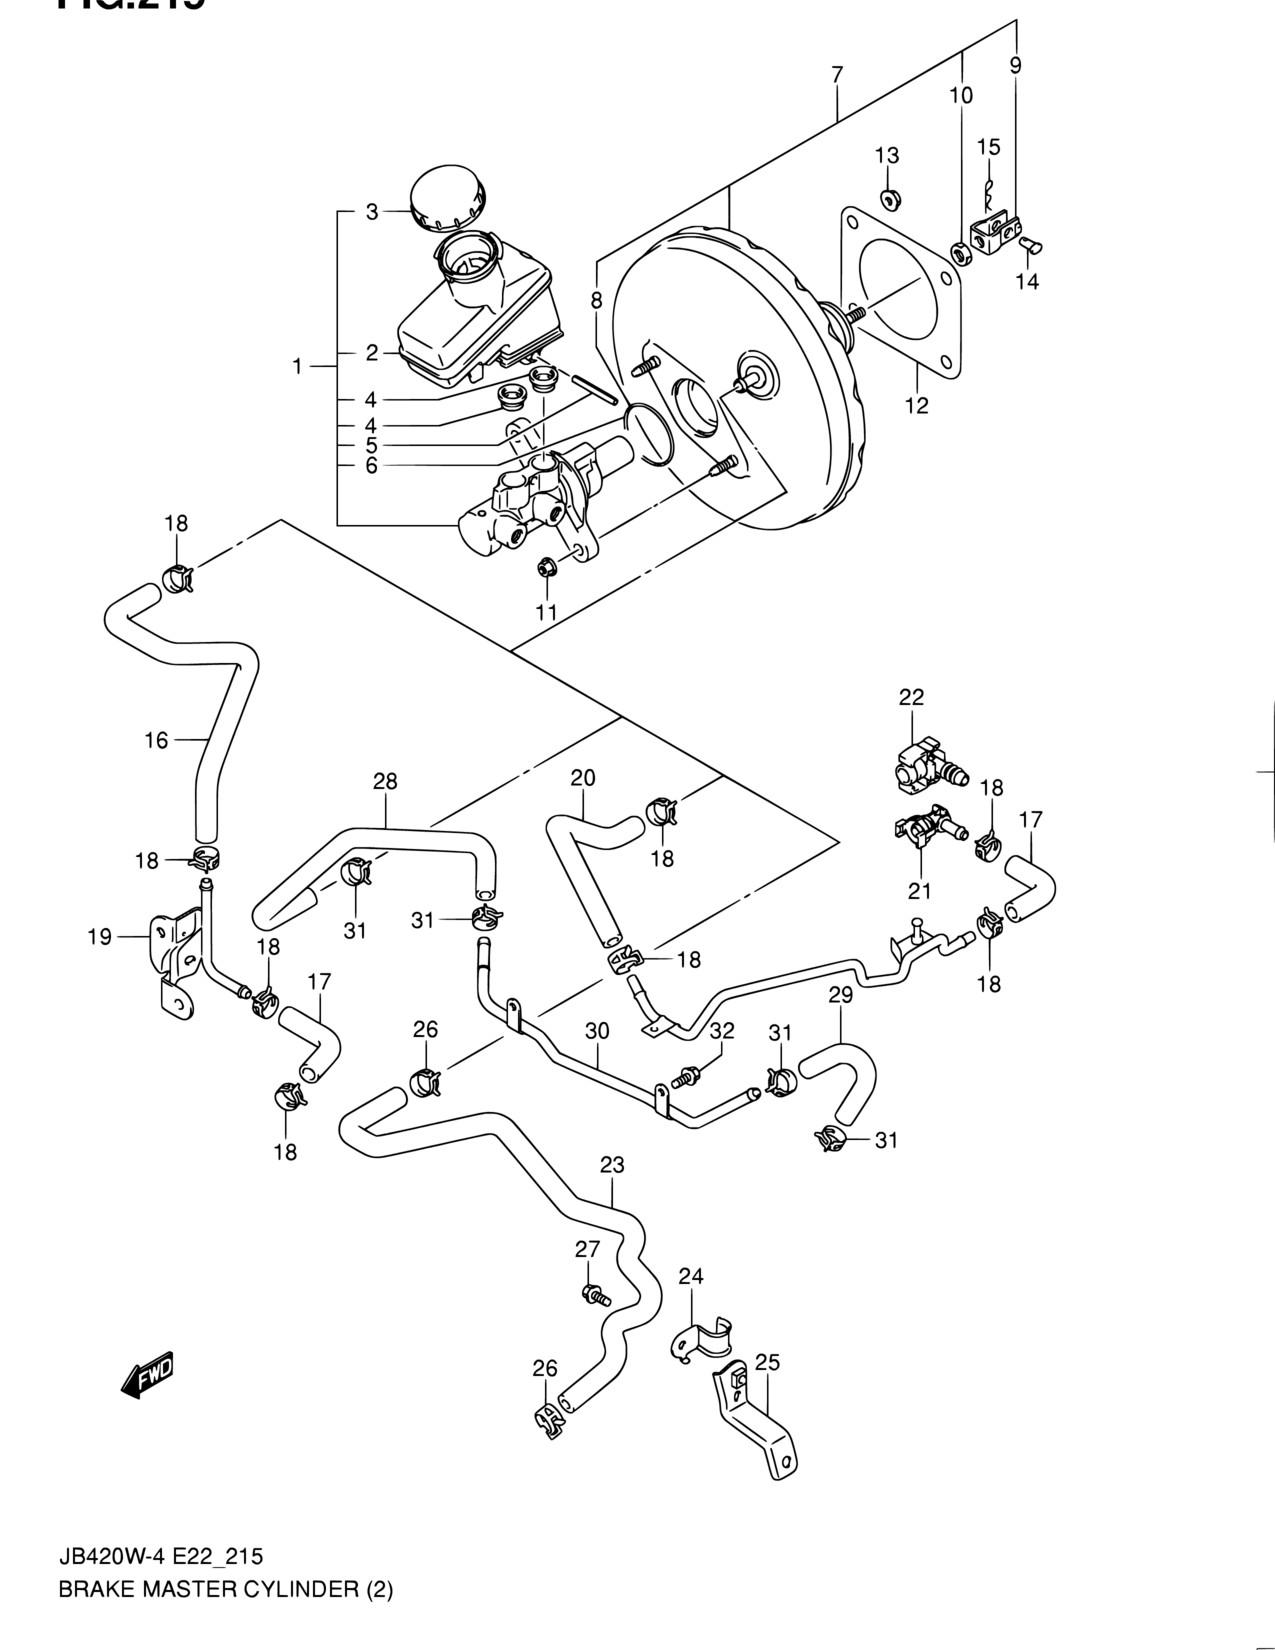 Brake Booster Parts Diagram Hatco Glo Ray Wiring Diagram